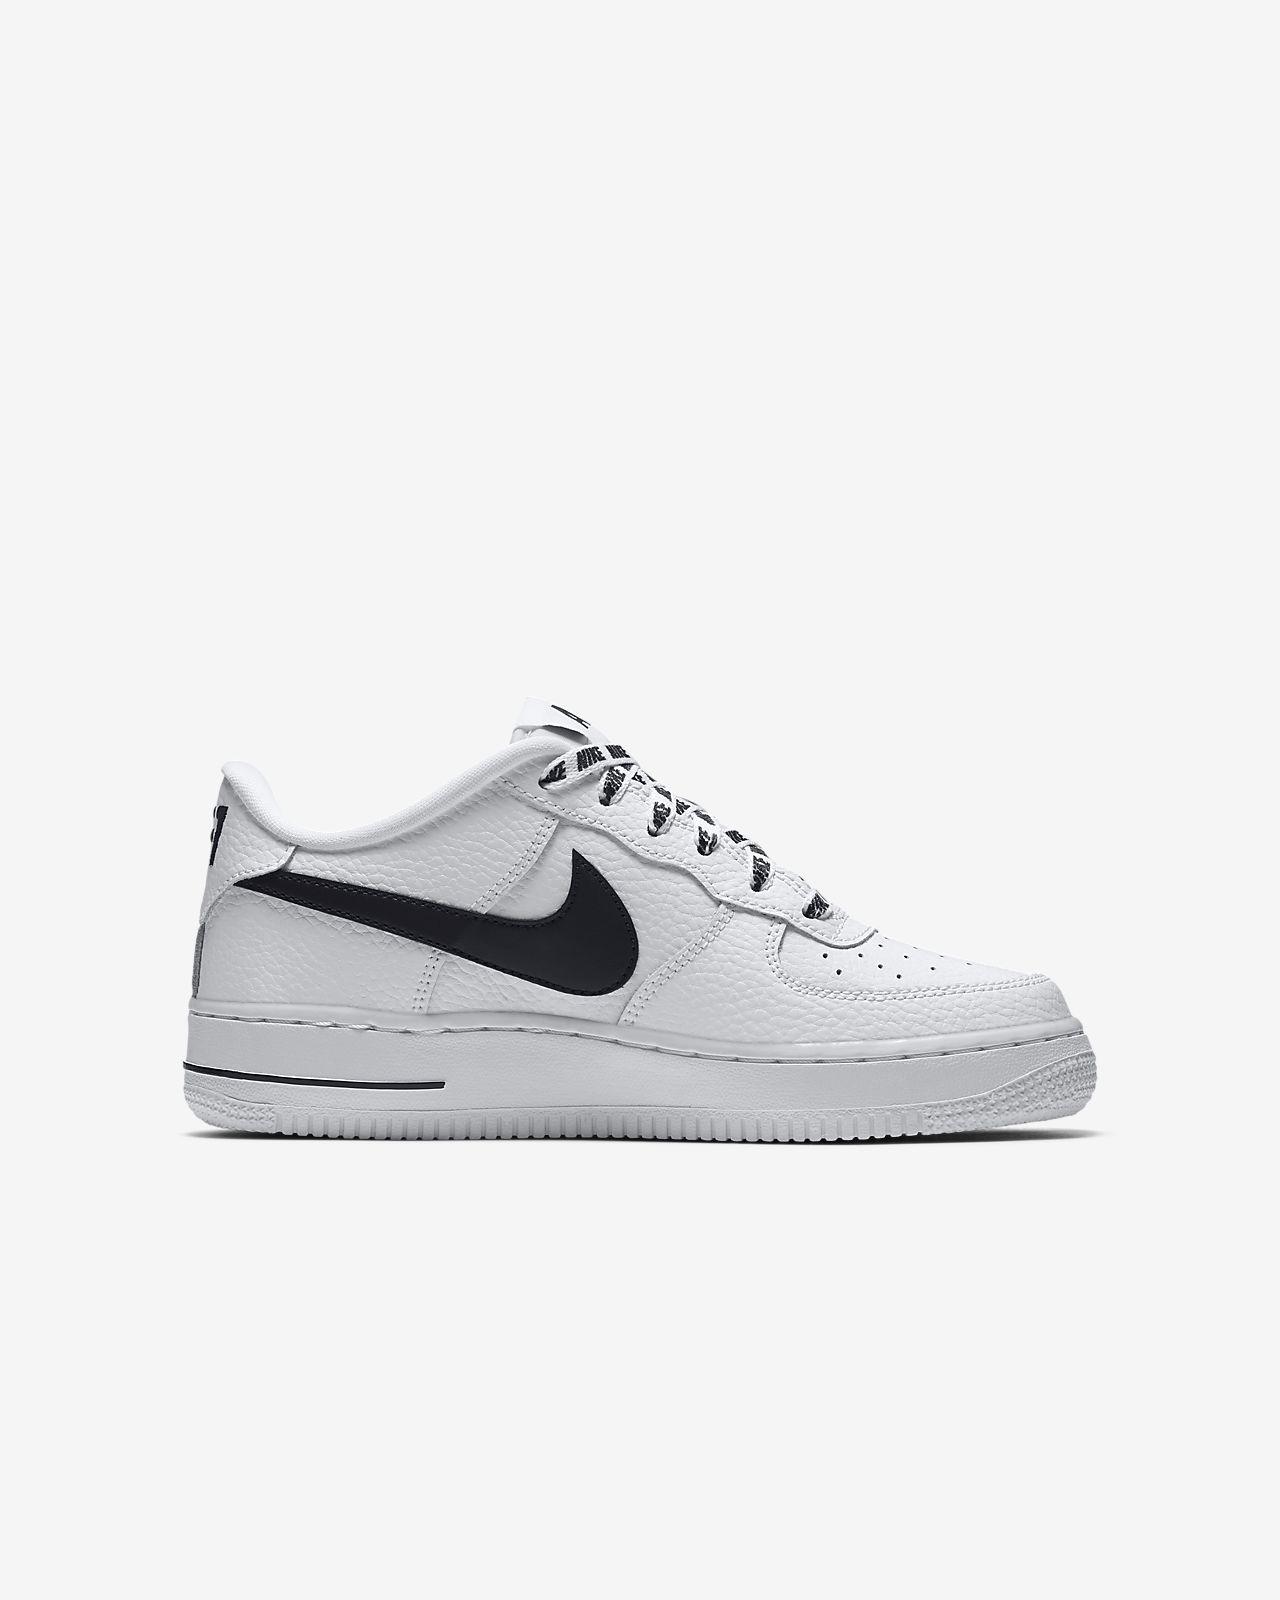 nike air force 1 noir et blanc